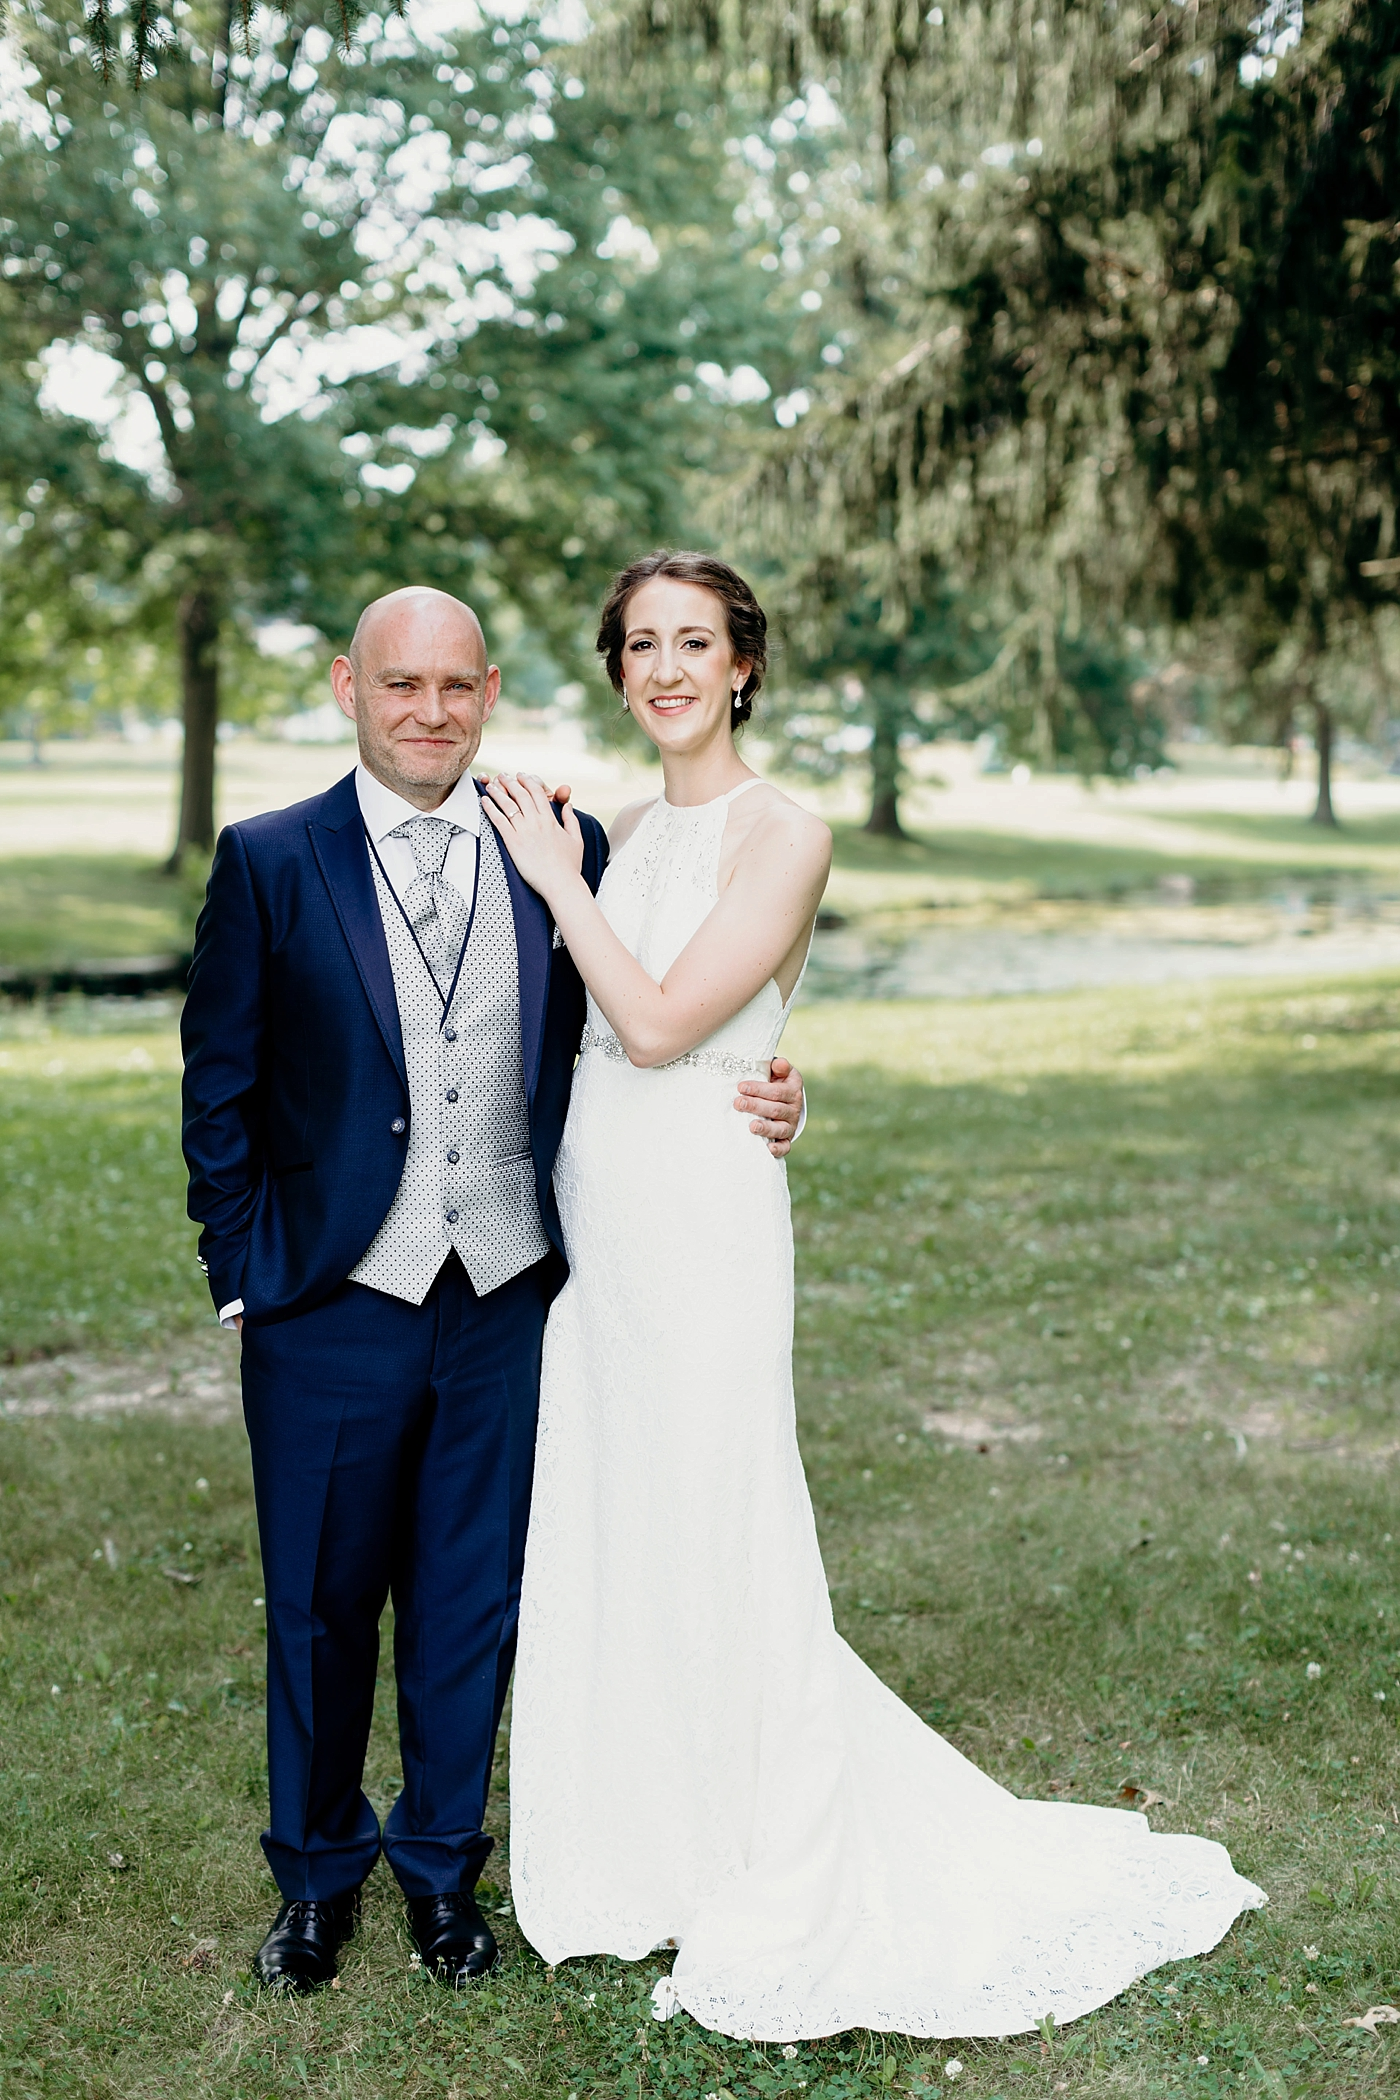 Chateau-Michelle-Wedding-Julia+JuanLuis_TheHeartlandersCo2018LA-66.jpg